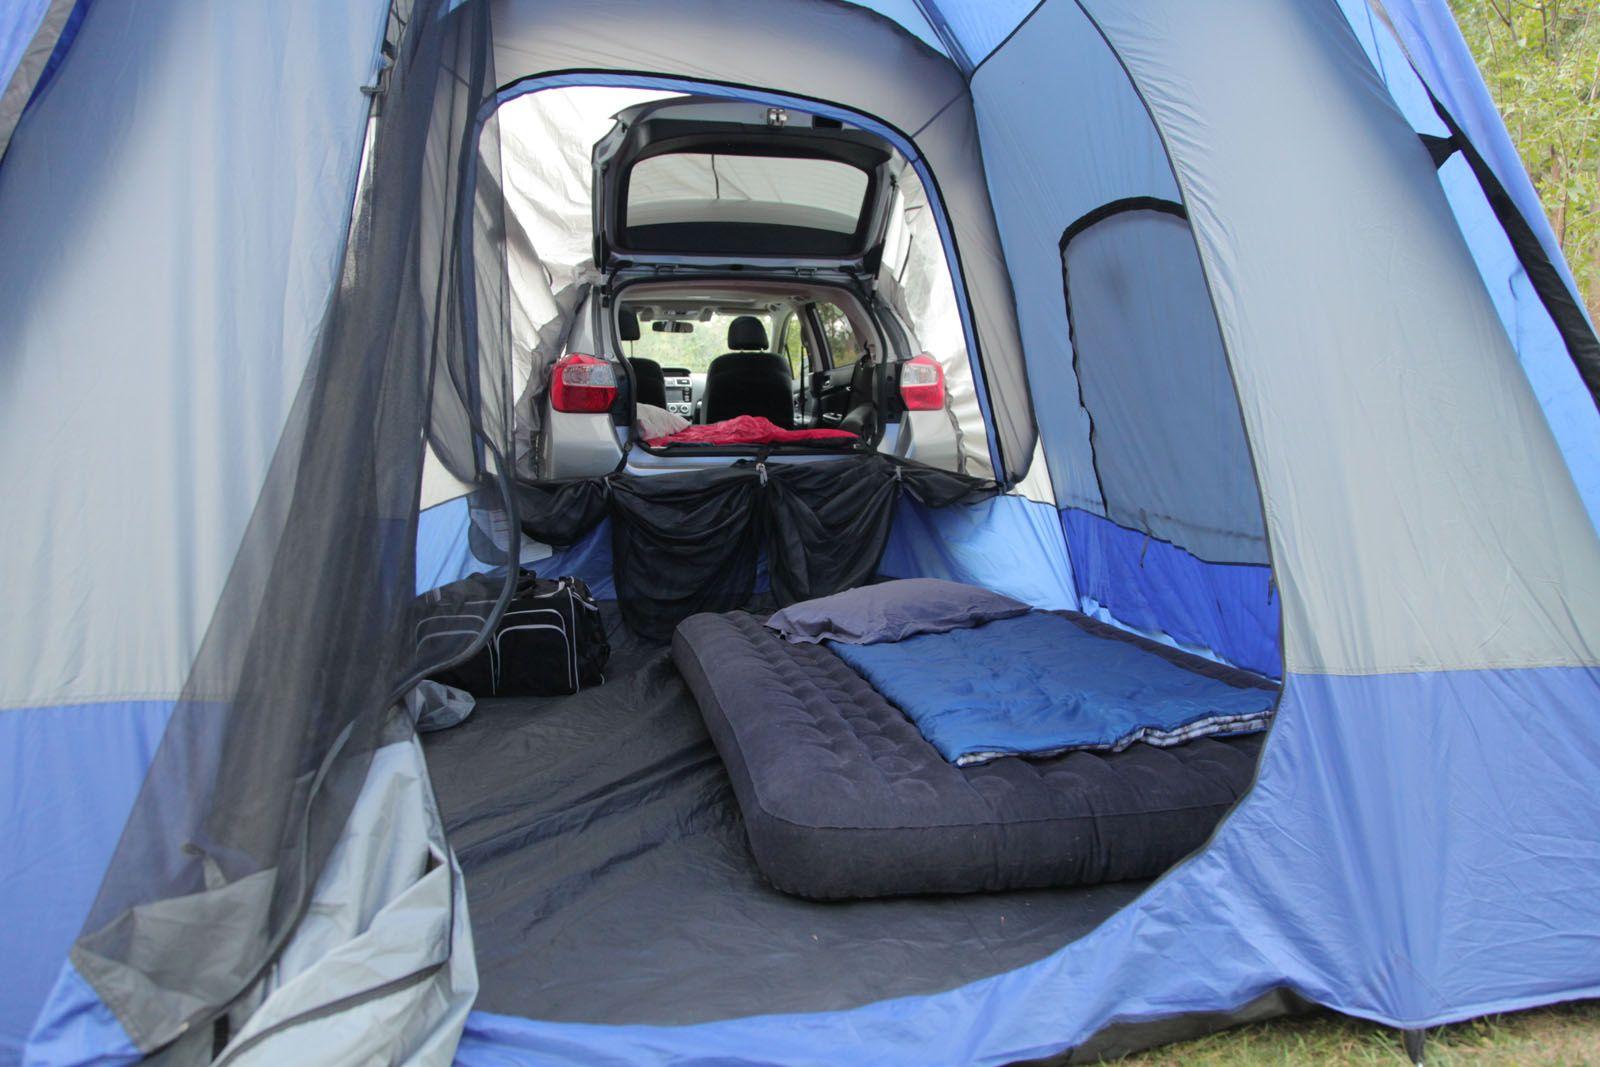 c&ing toyota sienna tent - Google Search .mercedtoyota.com & camping toyota sienna tent - Google Search www.mercedtoyota.com ...